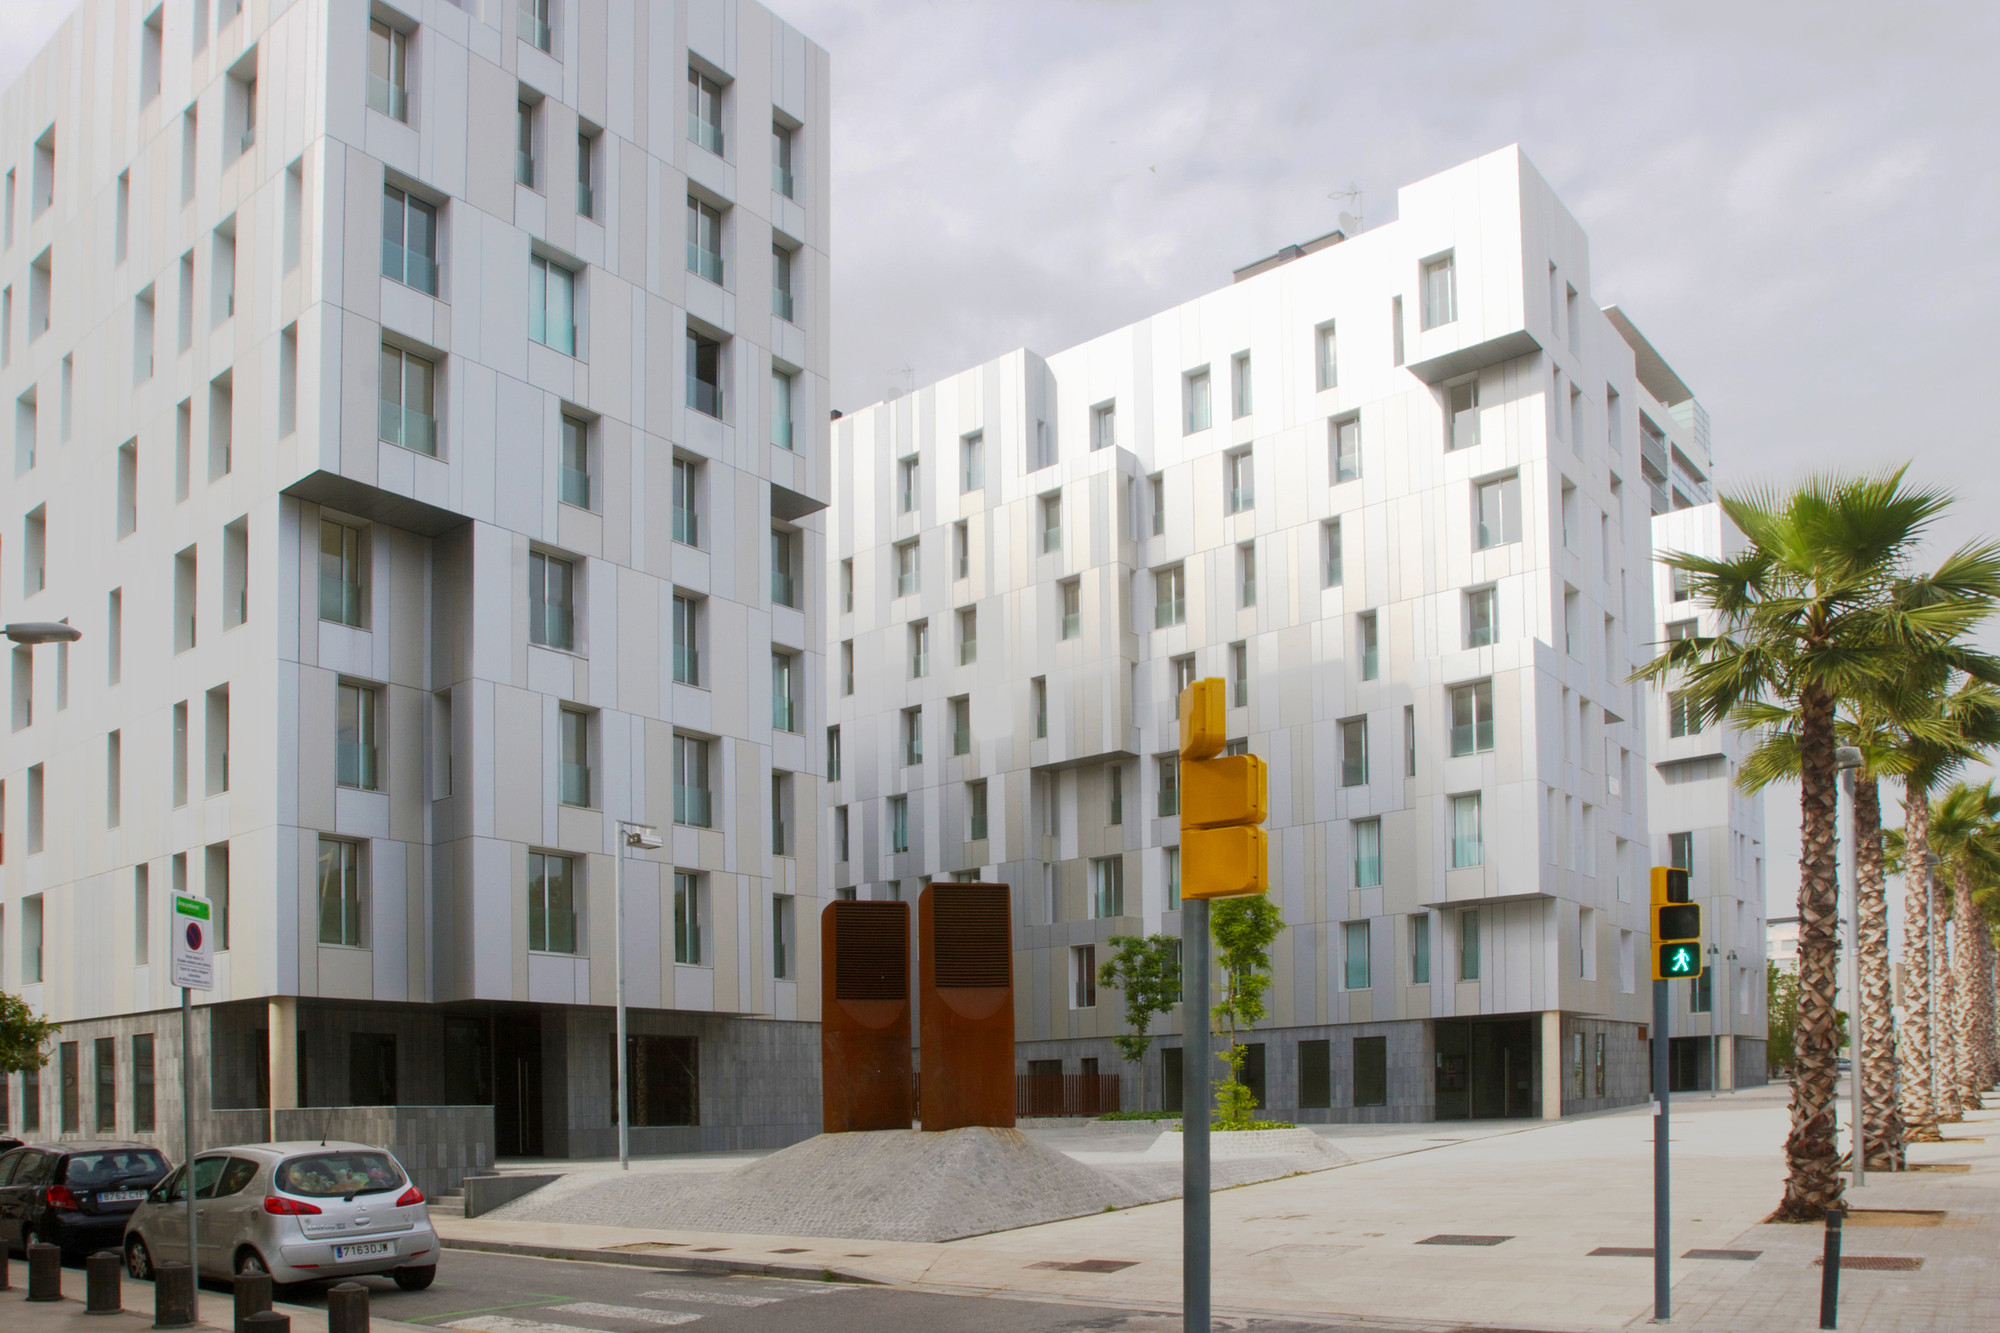 Edificio Tritón / Saeta Estudi + Lluís Cantallops  + Juan Domingo, Cortesía de Saeta estudi